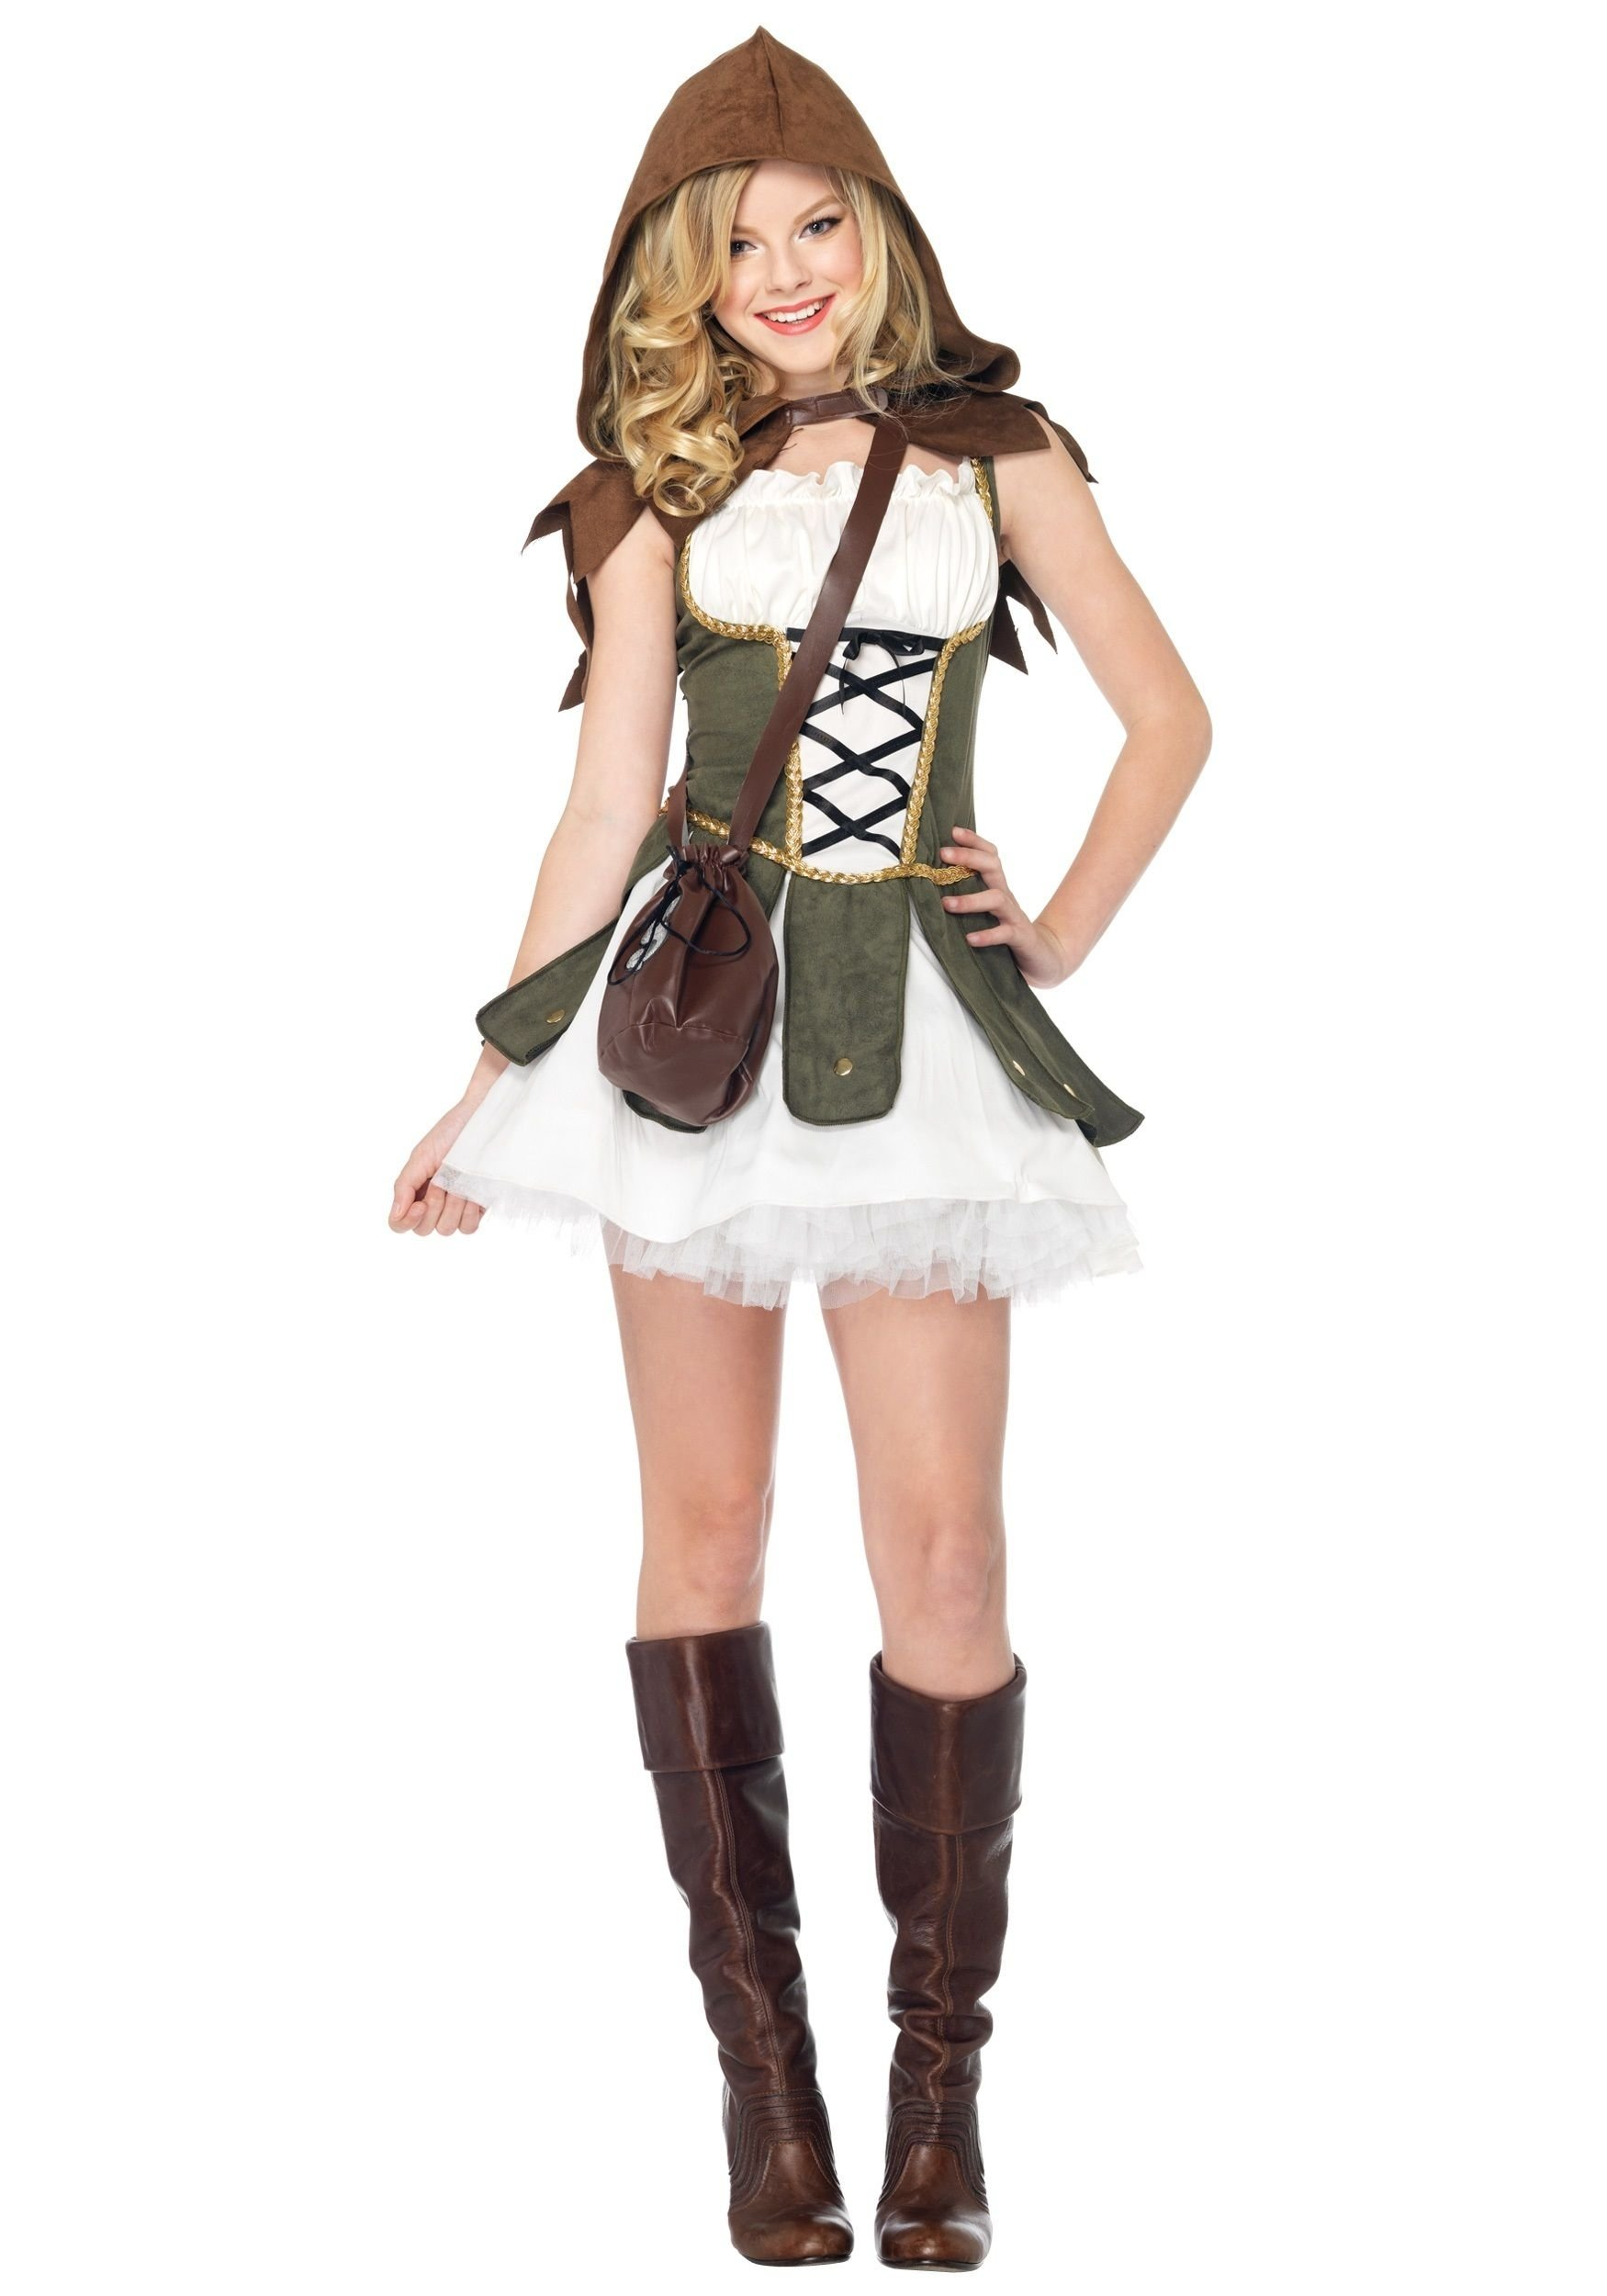 10 Famous Halloween Costume Ideas Teenage Girl teengirlhalloweencostumes halloween costumes and party supplies 2020